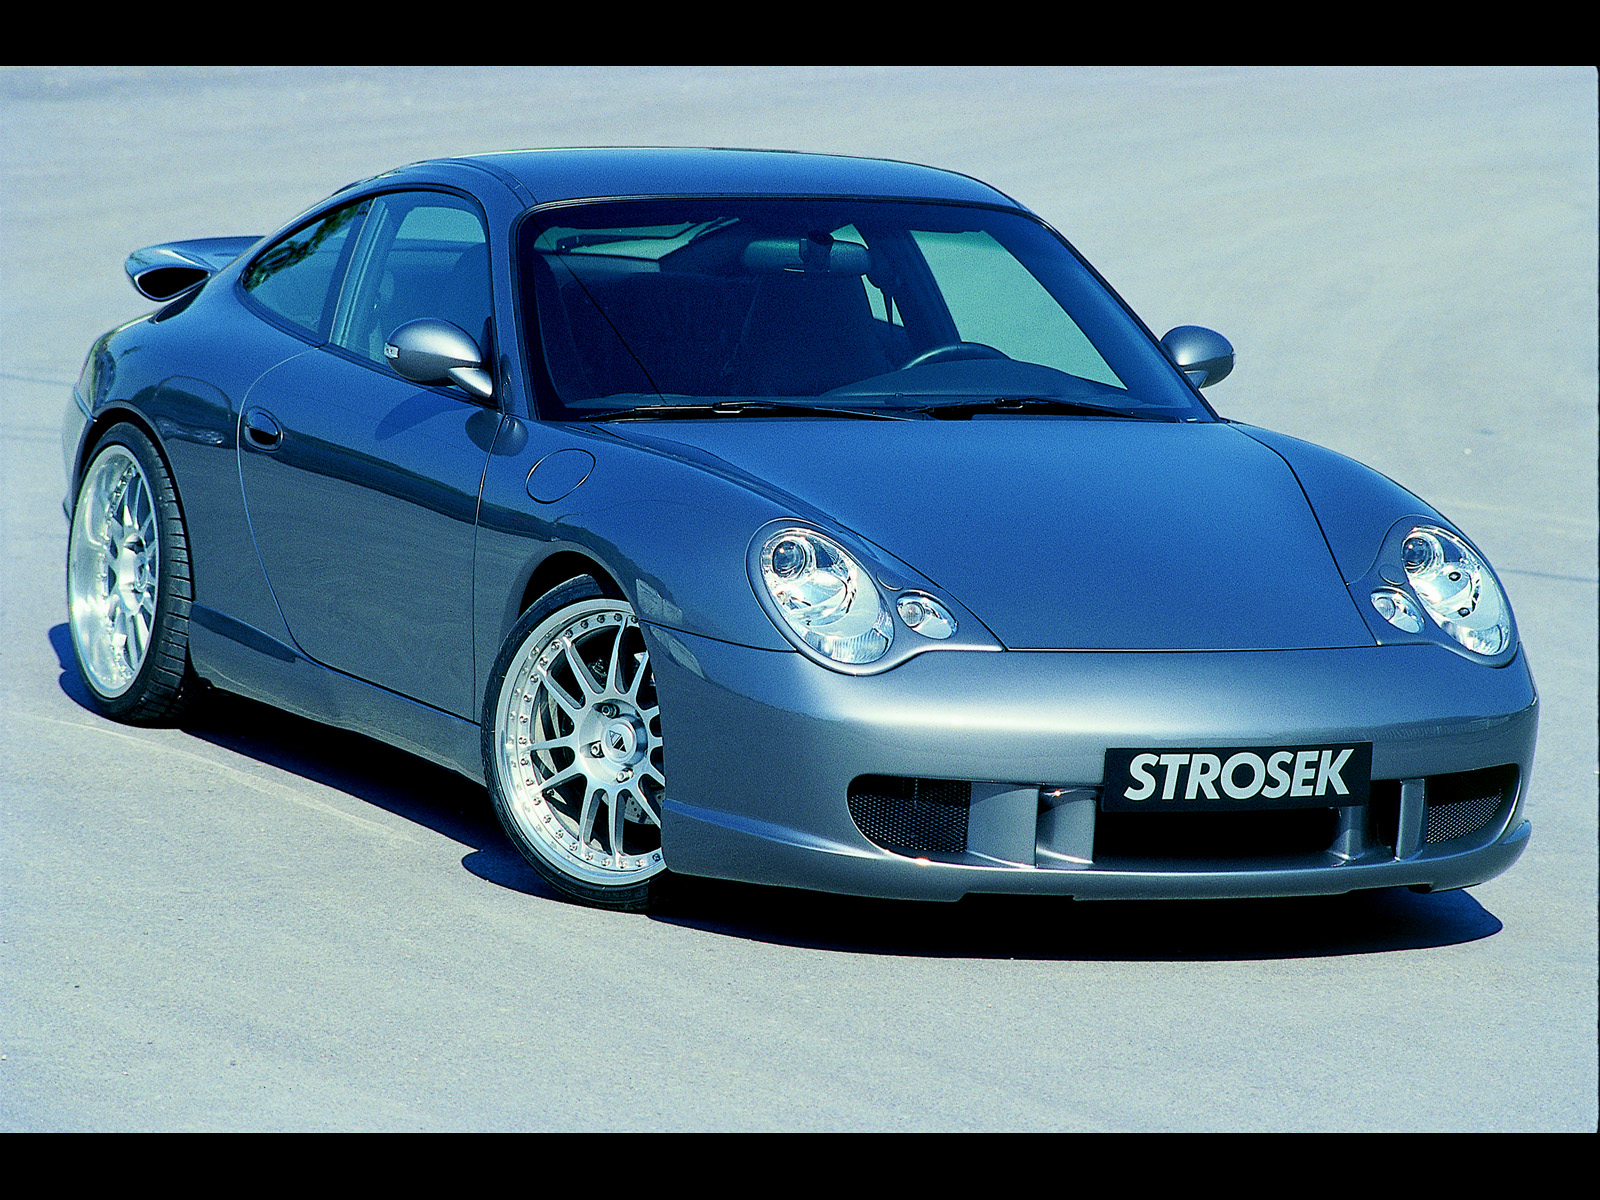 Strosek Porsche 996 911 Carrera Photos Photogallery With